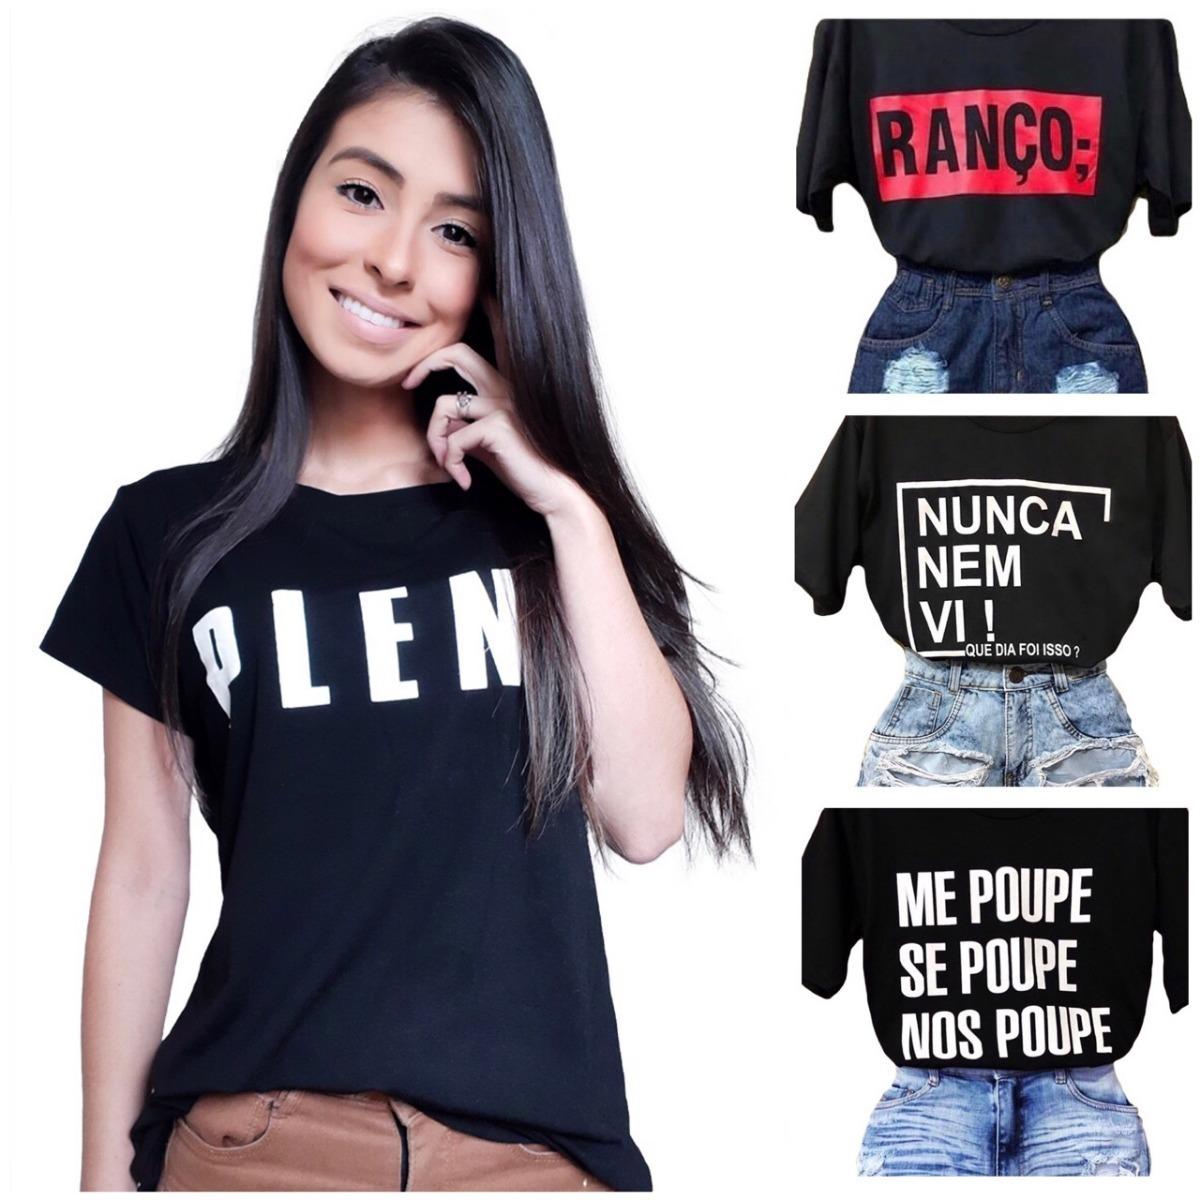 64b6001fc Kit C/ 7 Tshirt Camiseta Feminina Frases Moda Instagram - R$ 120,90 ...